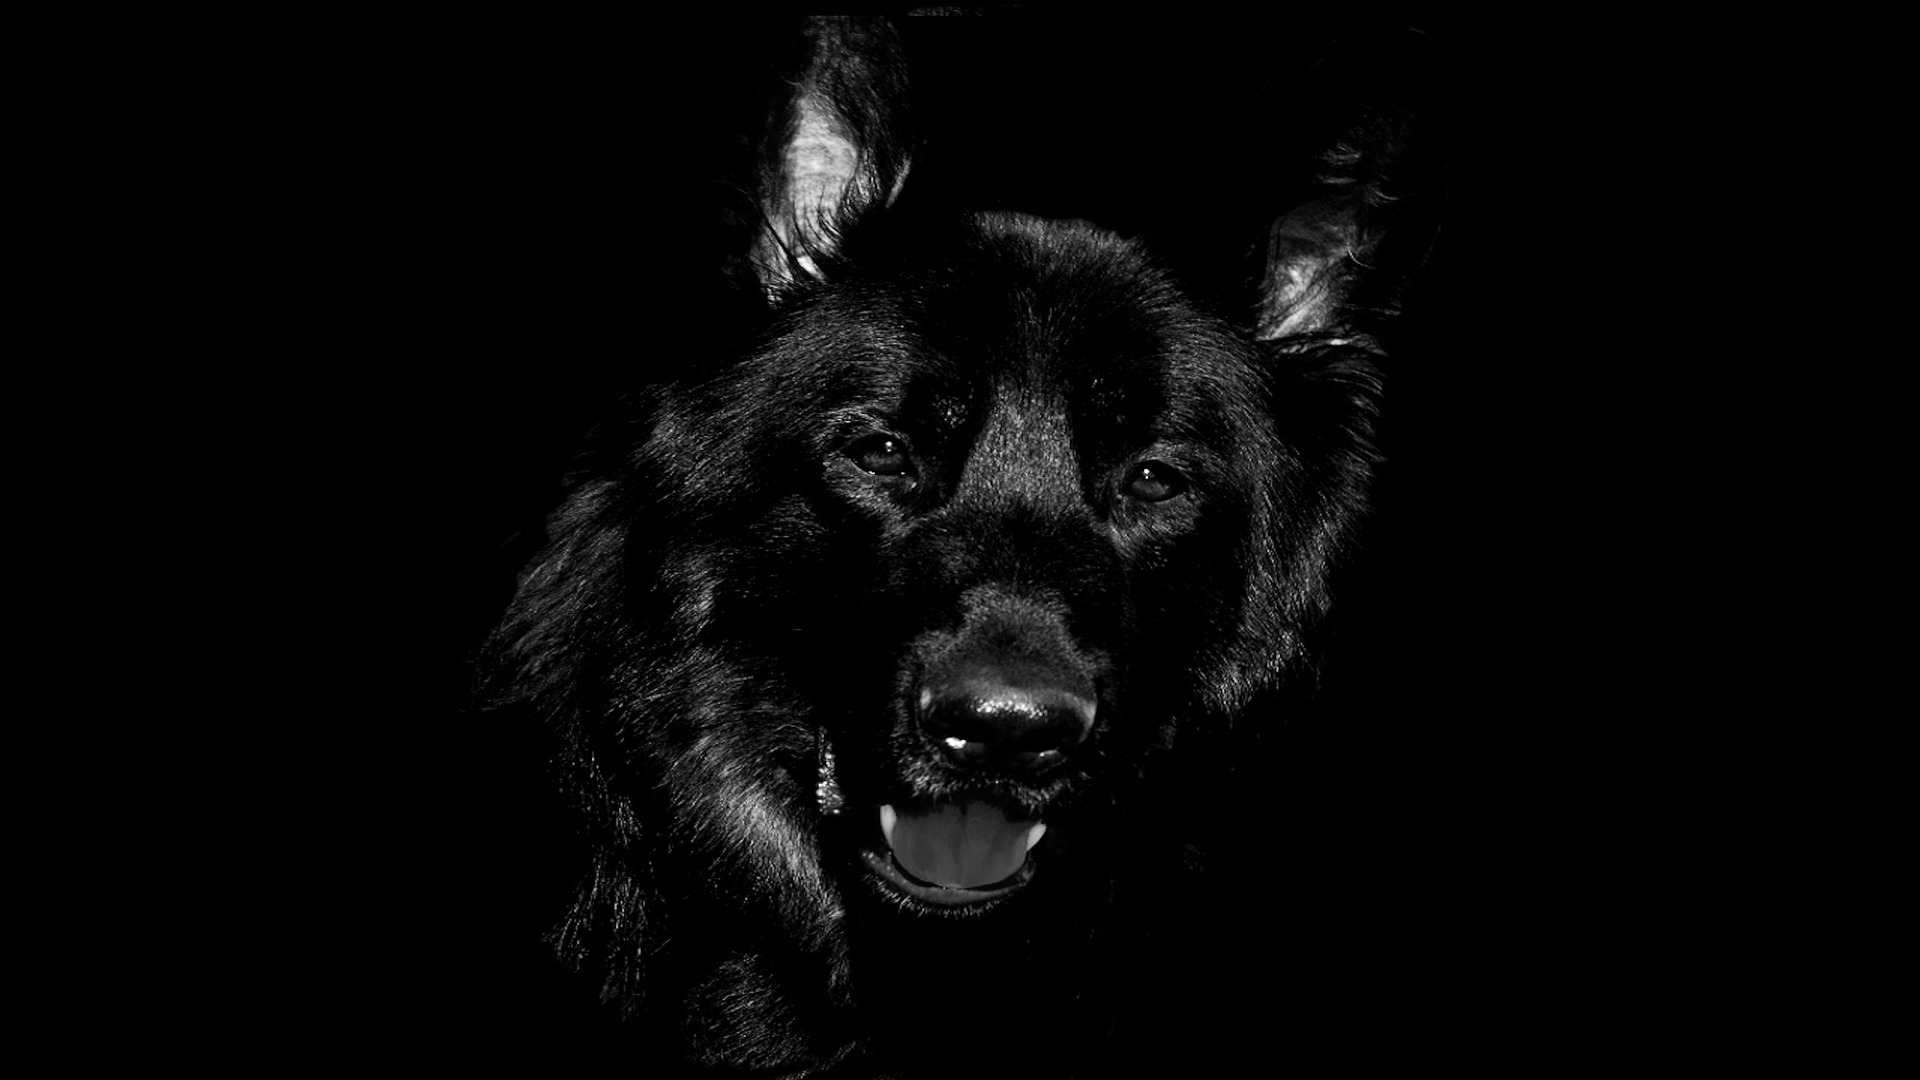 La historia del perro que anuncia la muerte 1920